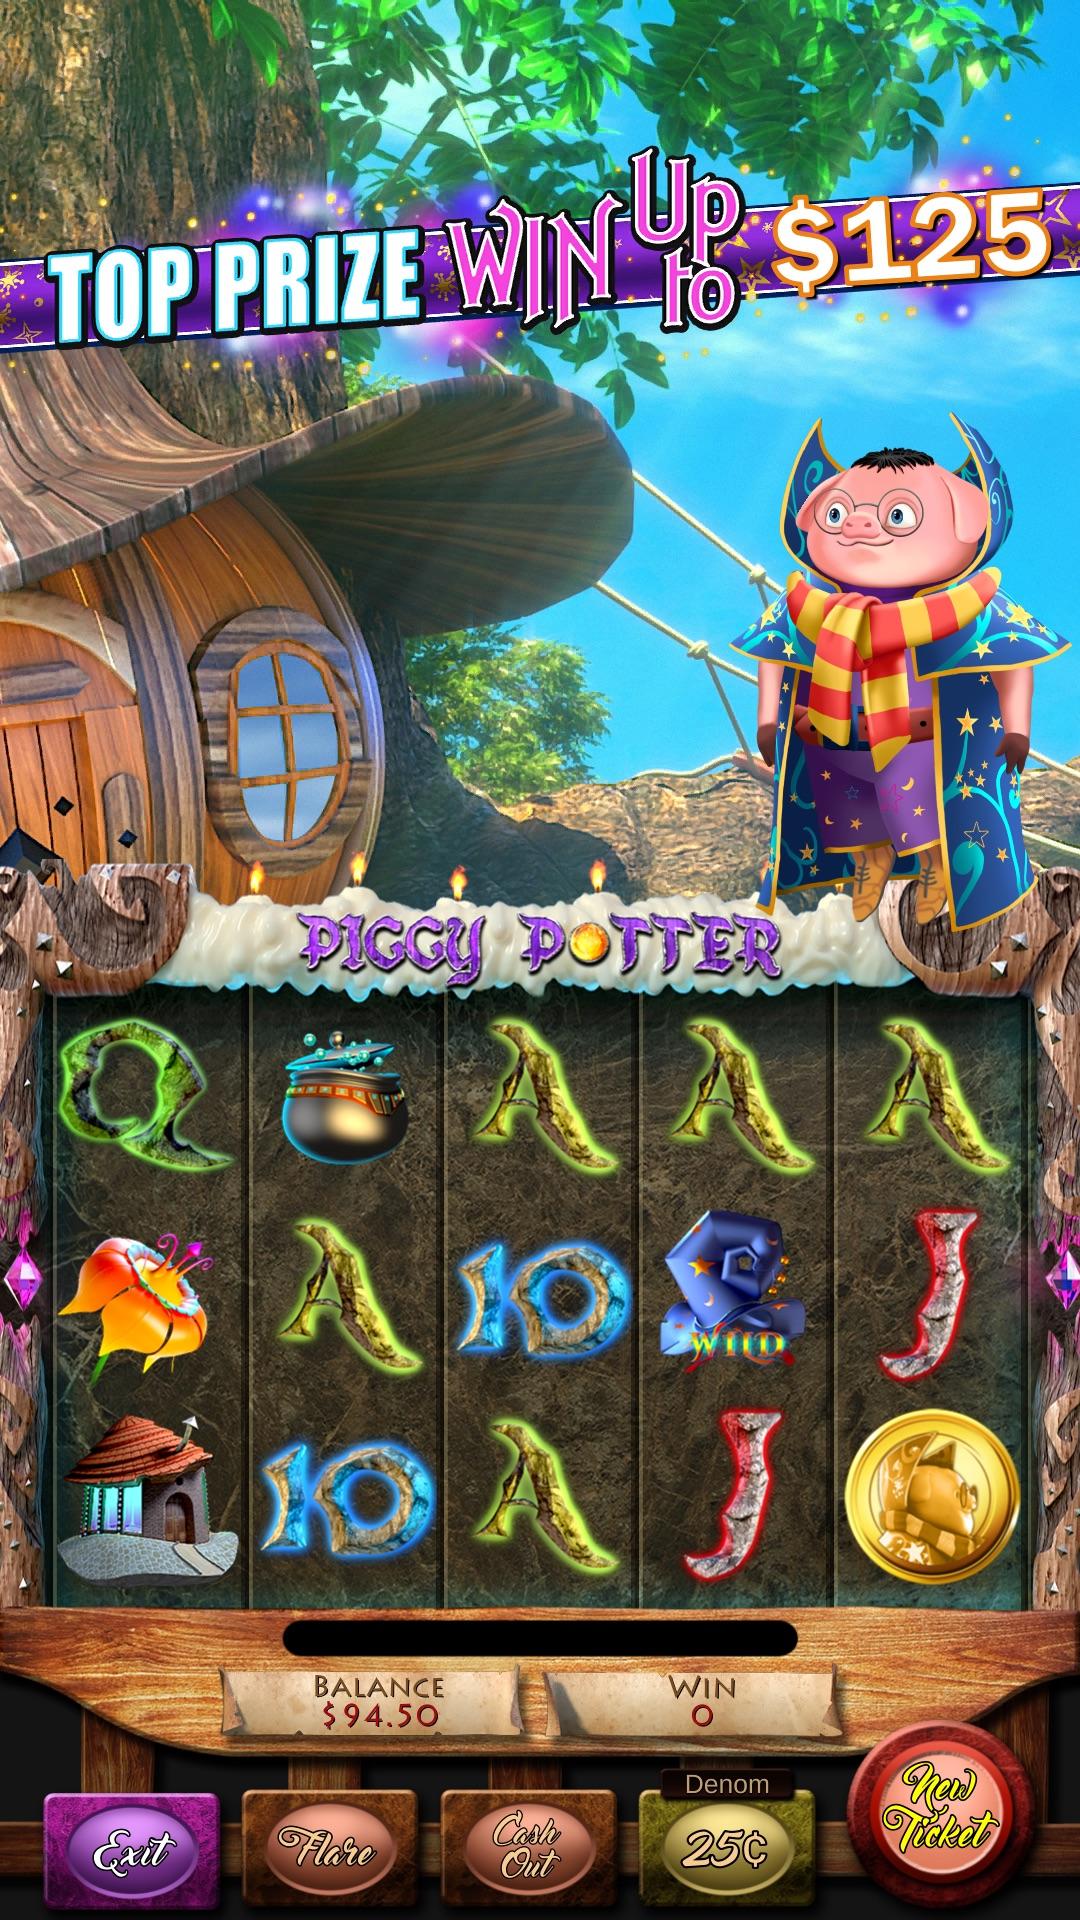 Piggy-Potter-pull-tab-game-screen-shot-hero